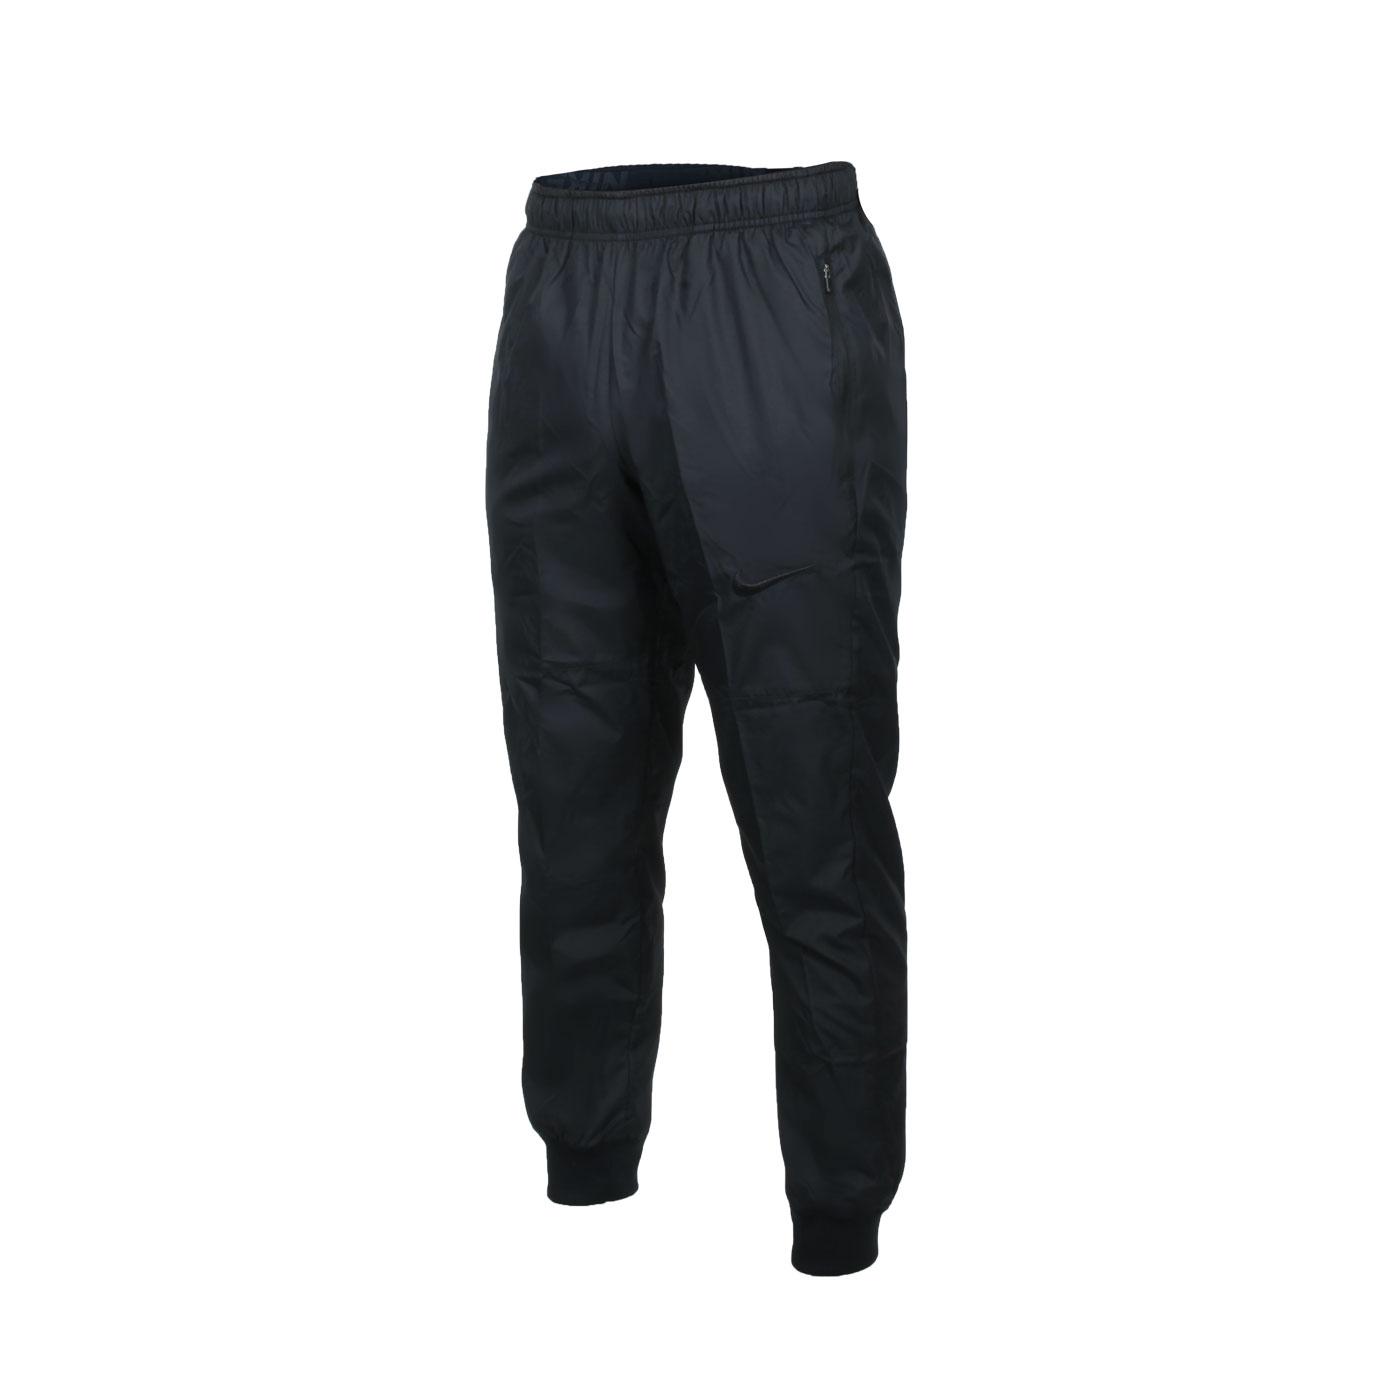 NIKE 男款休閒長褲 CU6735-010 - 黑